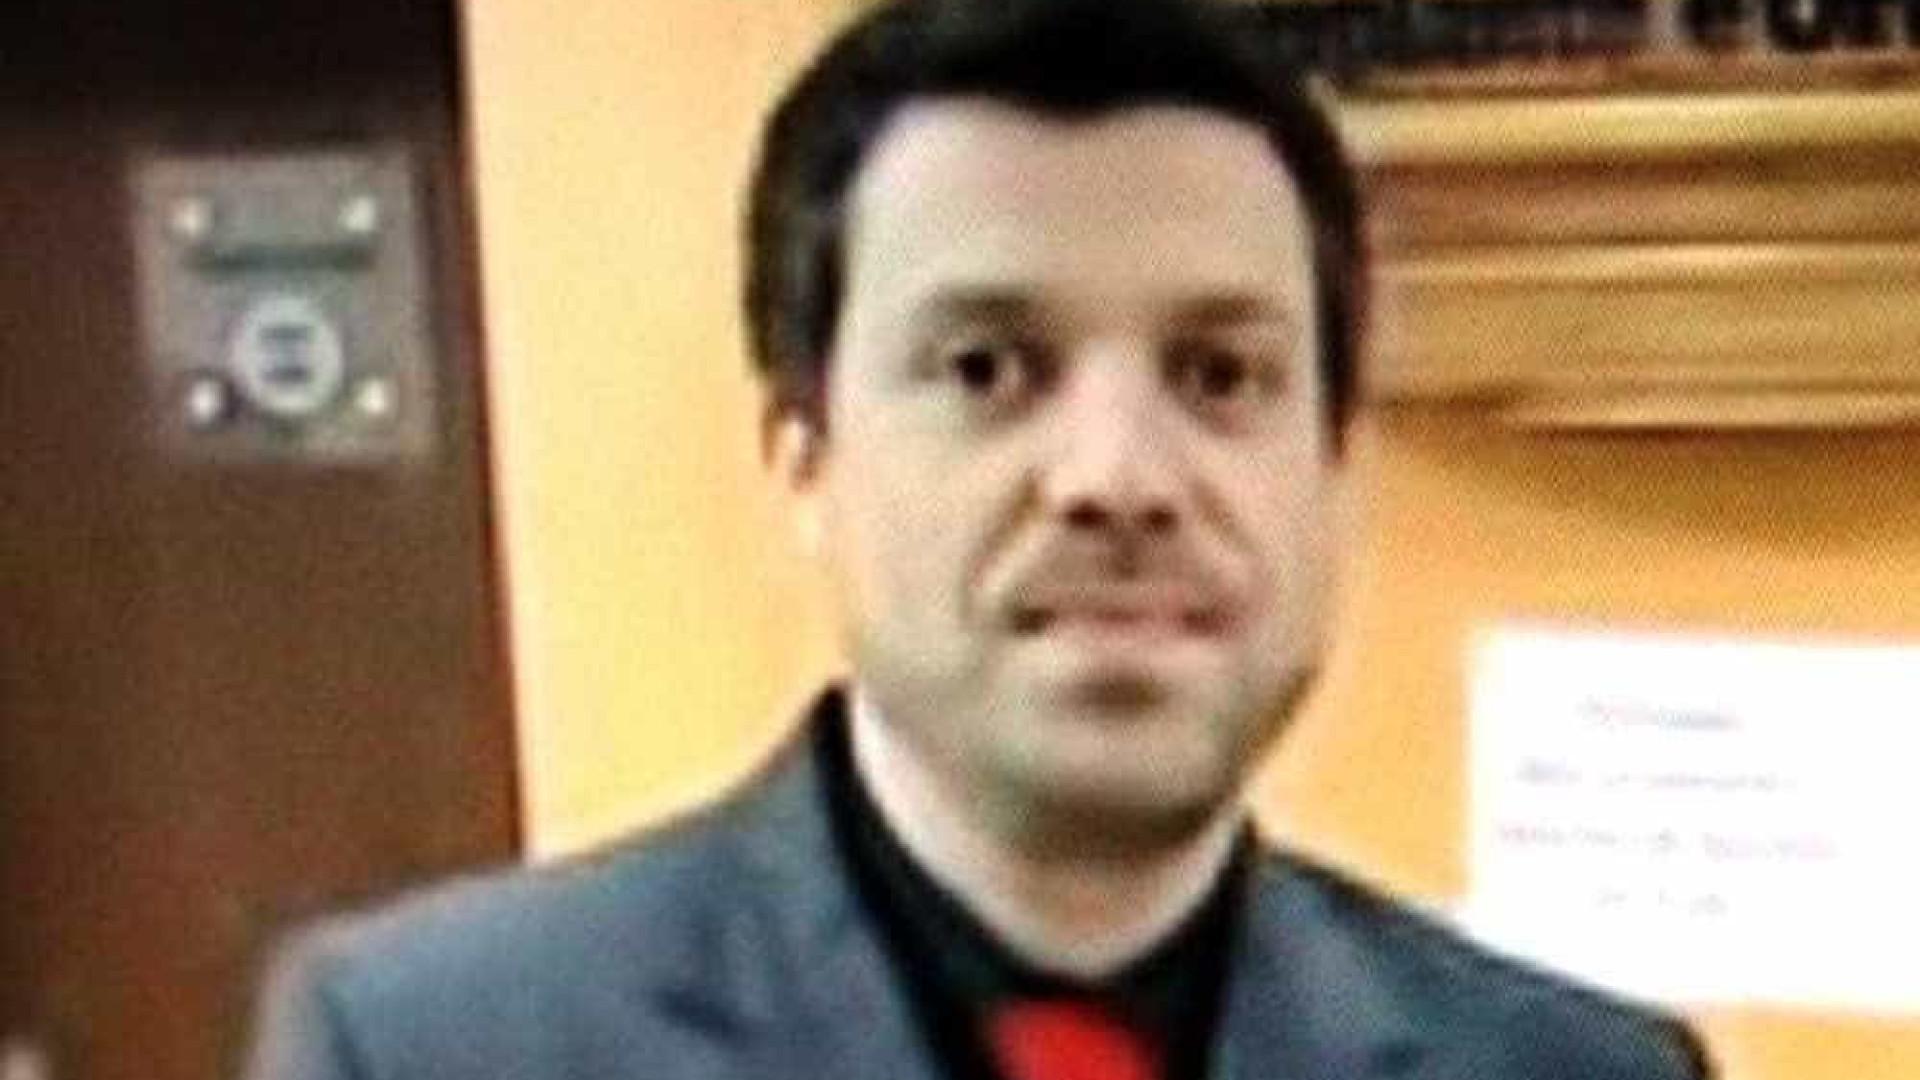 Dentista 'serial killer' é preso após matar 3 concorrentes